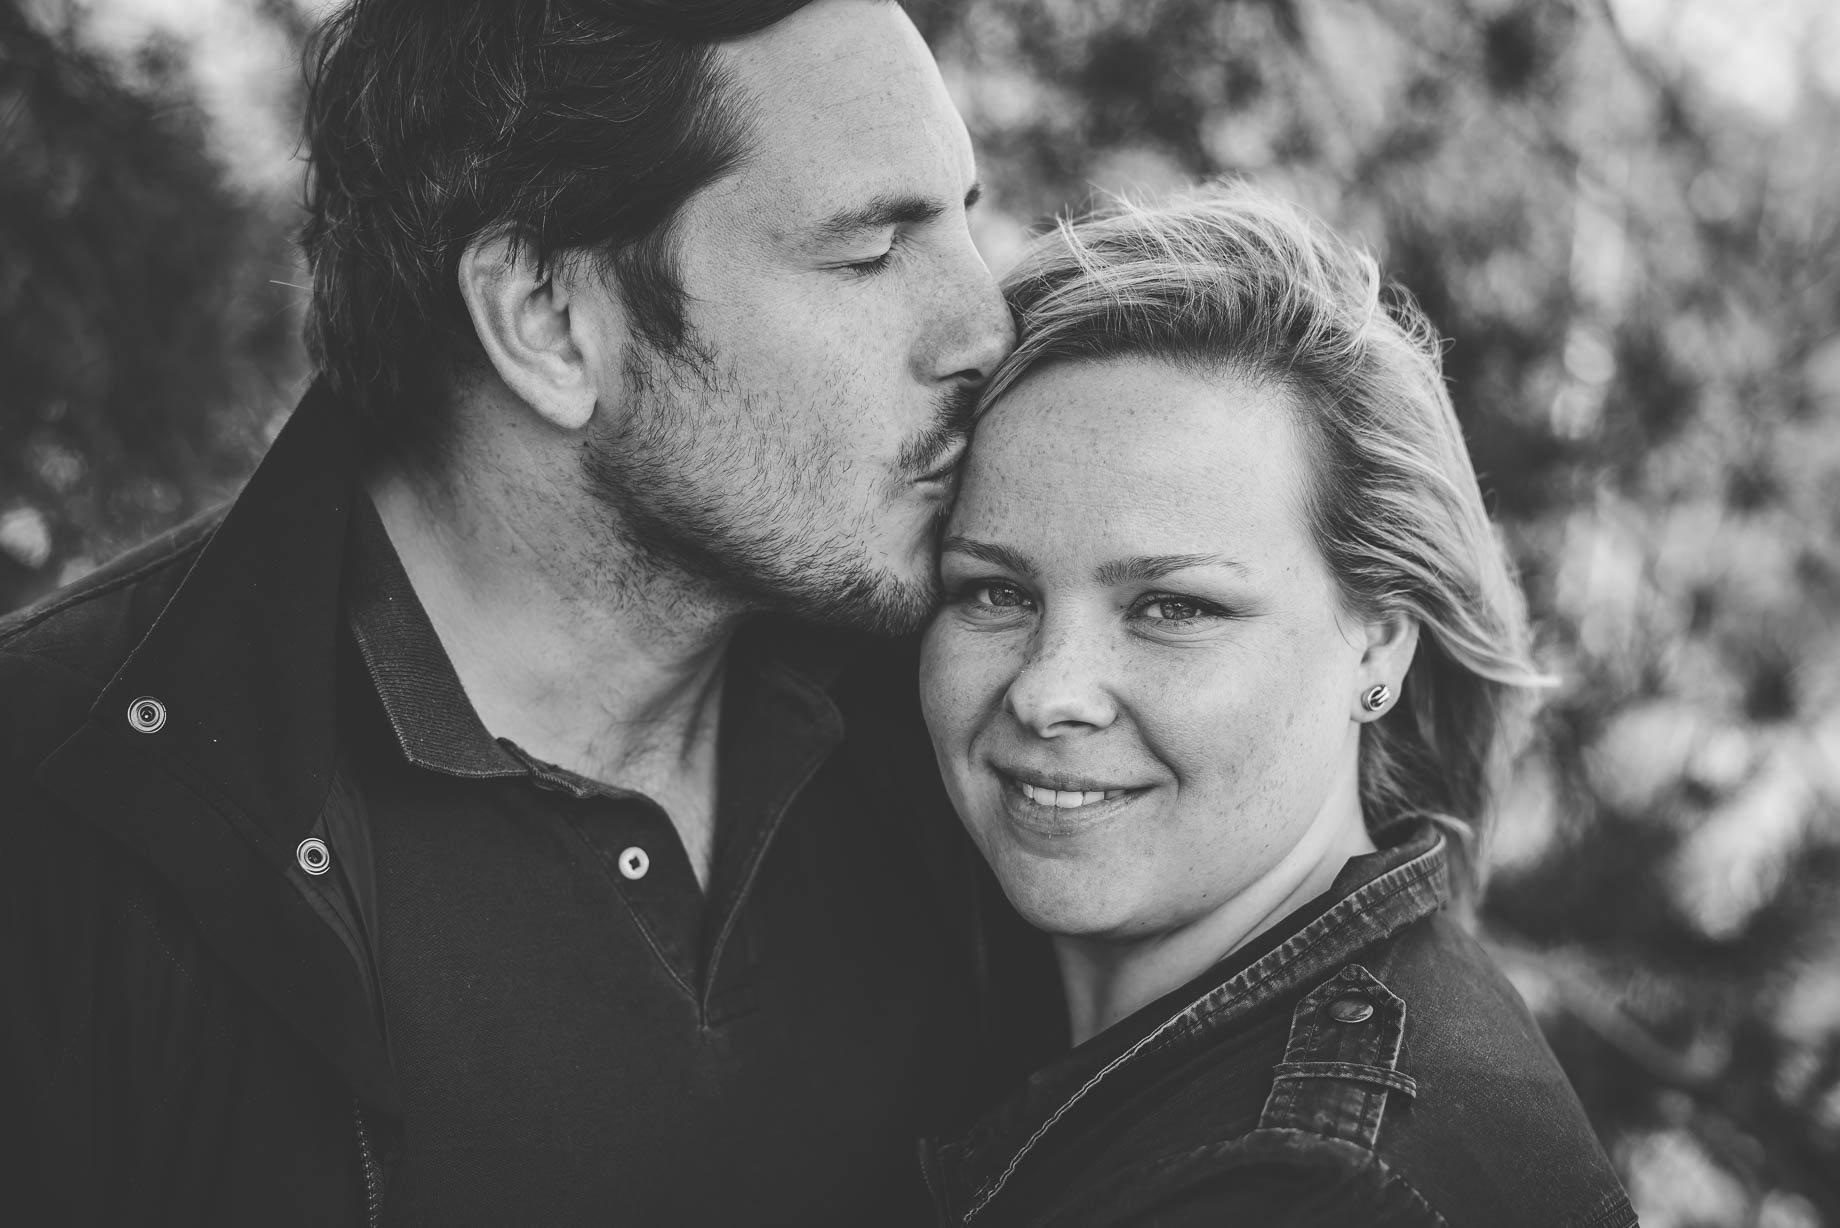 Frensham-wedding-photography-Sophie-and-Sean-22-of-43